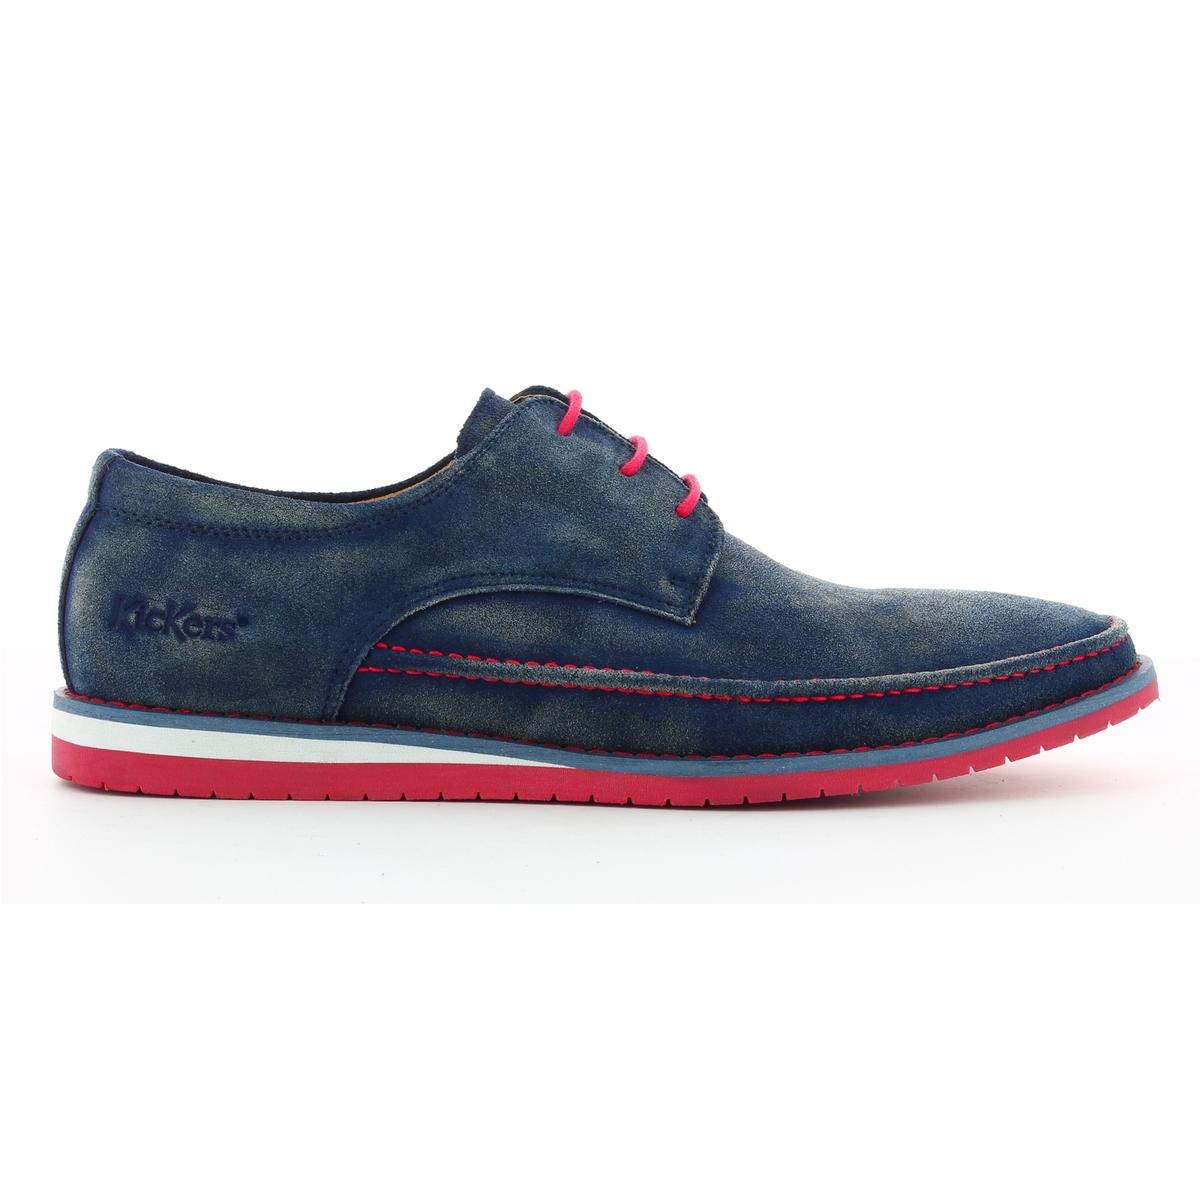 Ботинки-дерби из спилка на шнуровке Tumper ботинки из спилка